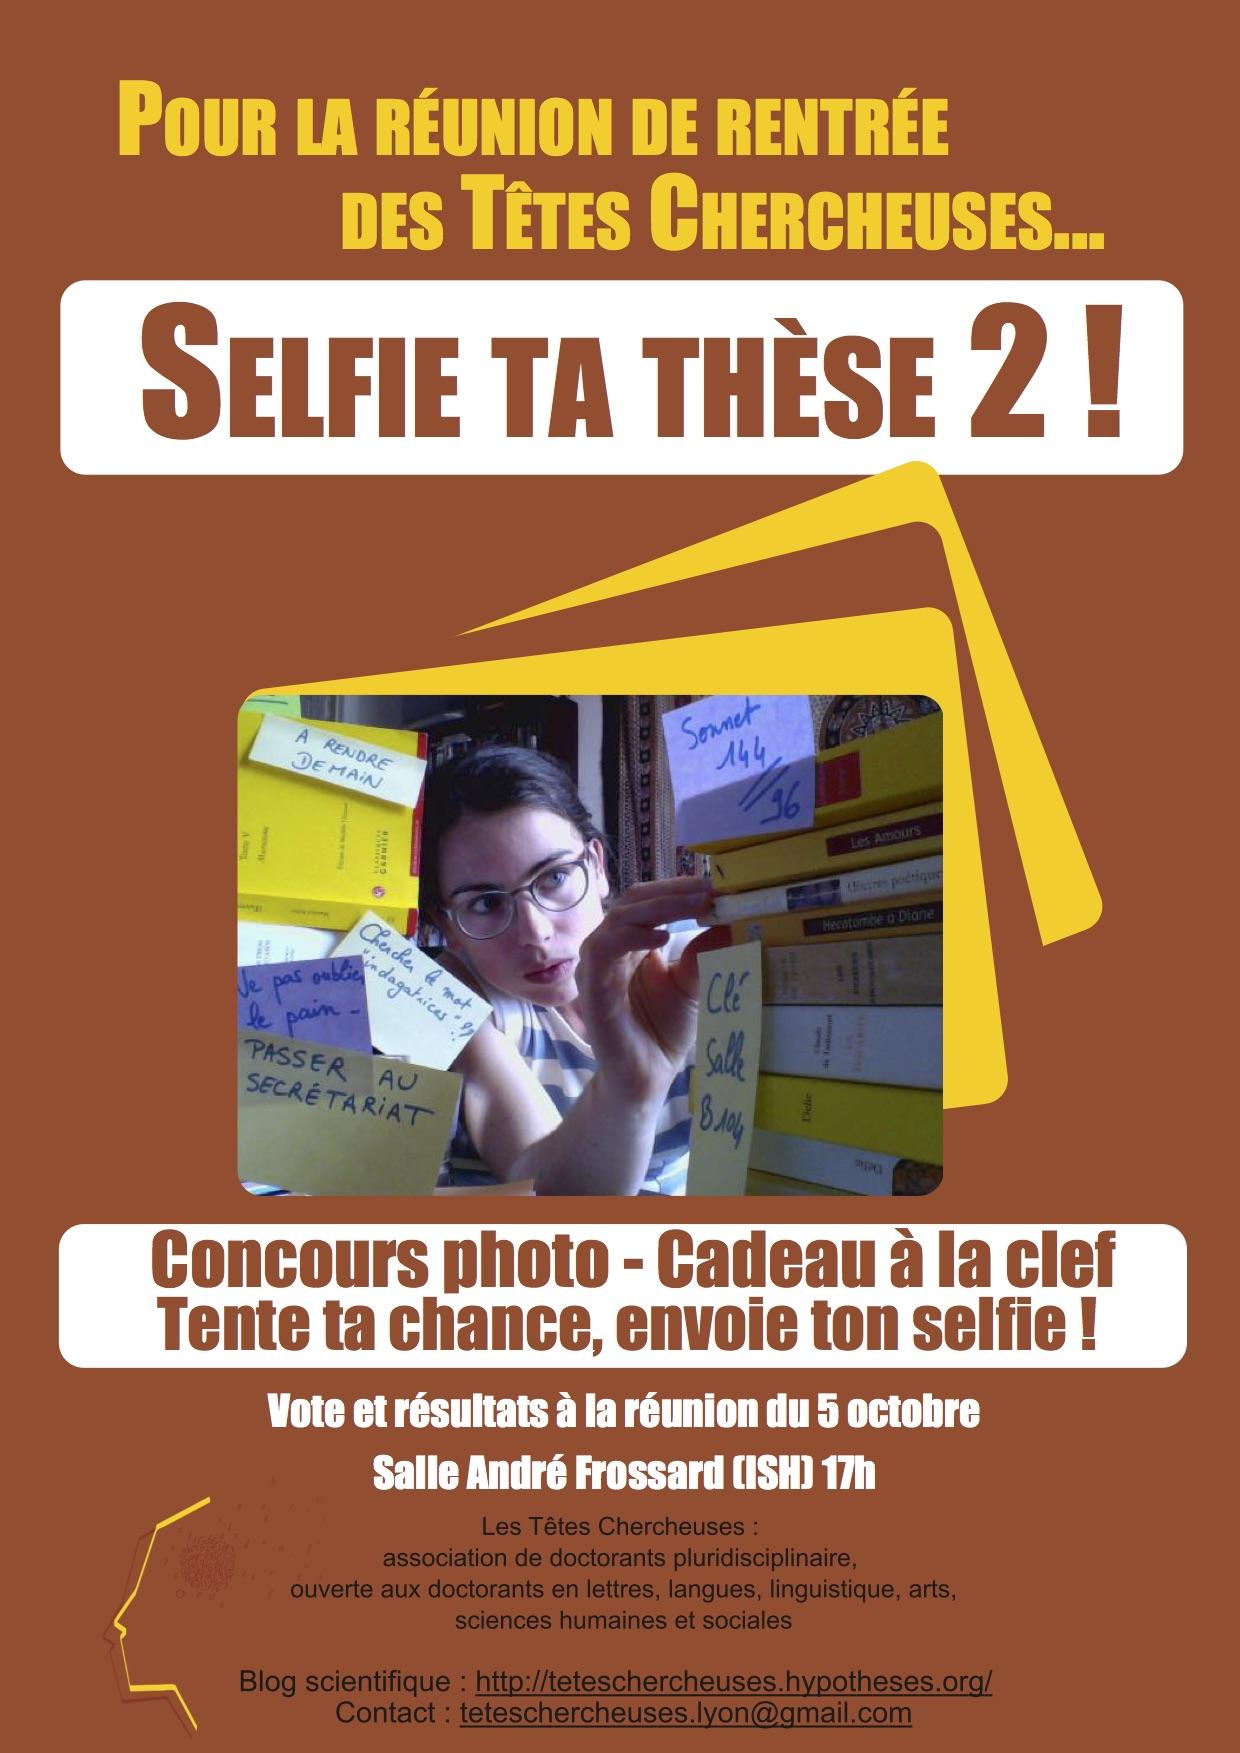 rentreeTC_5-10-15_selfie